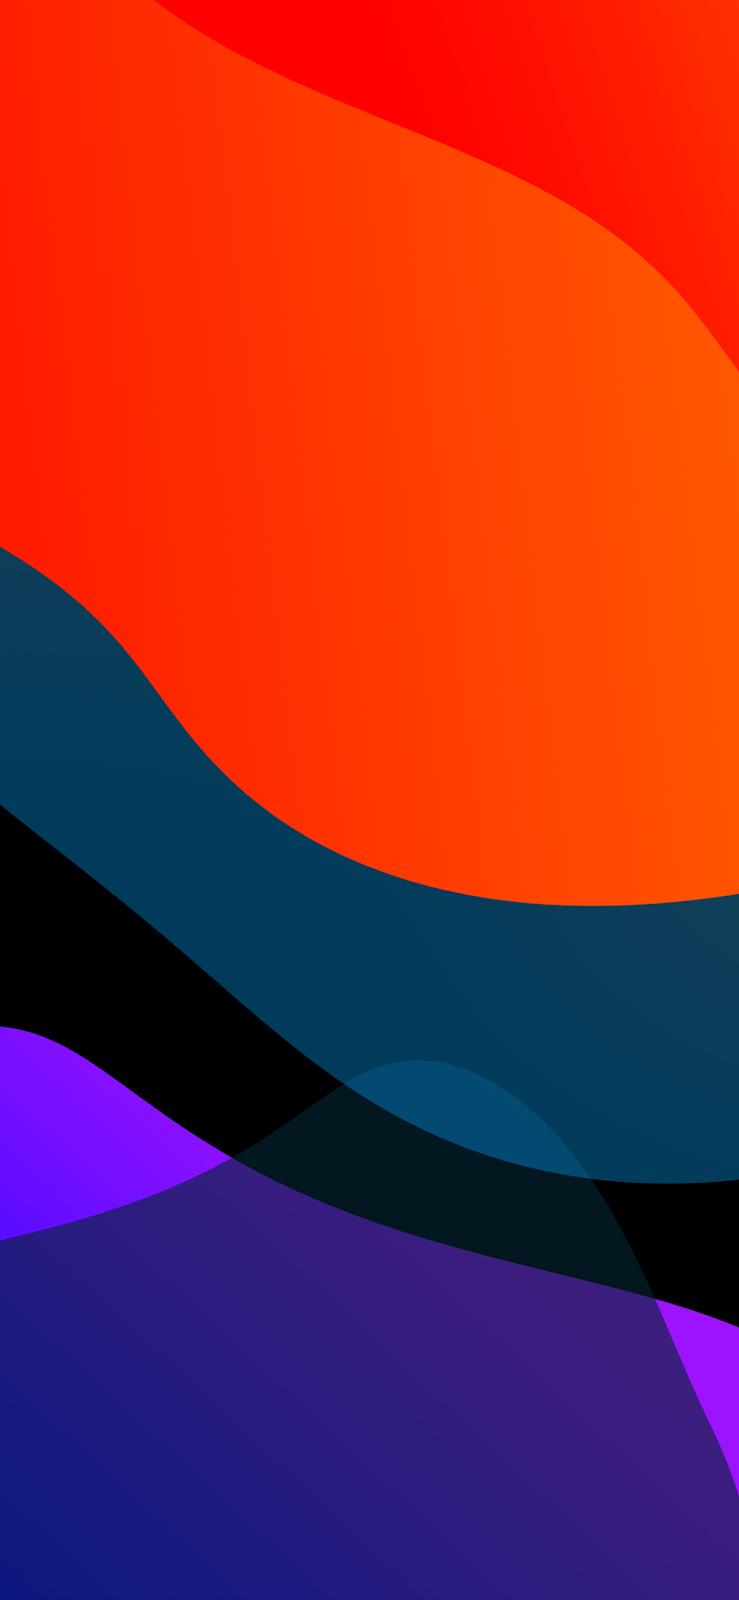 Geometric Curves (iOS13 inspired) by AR72014